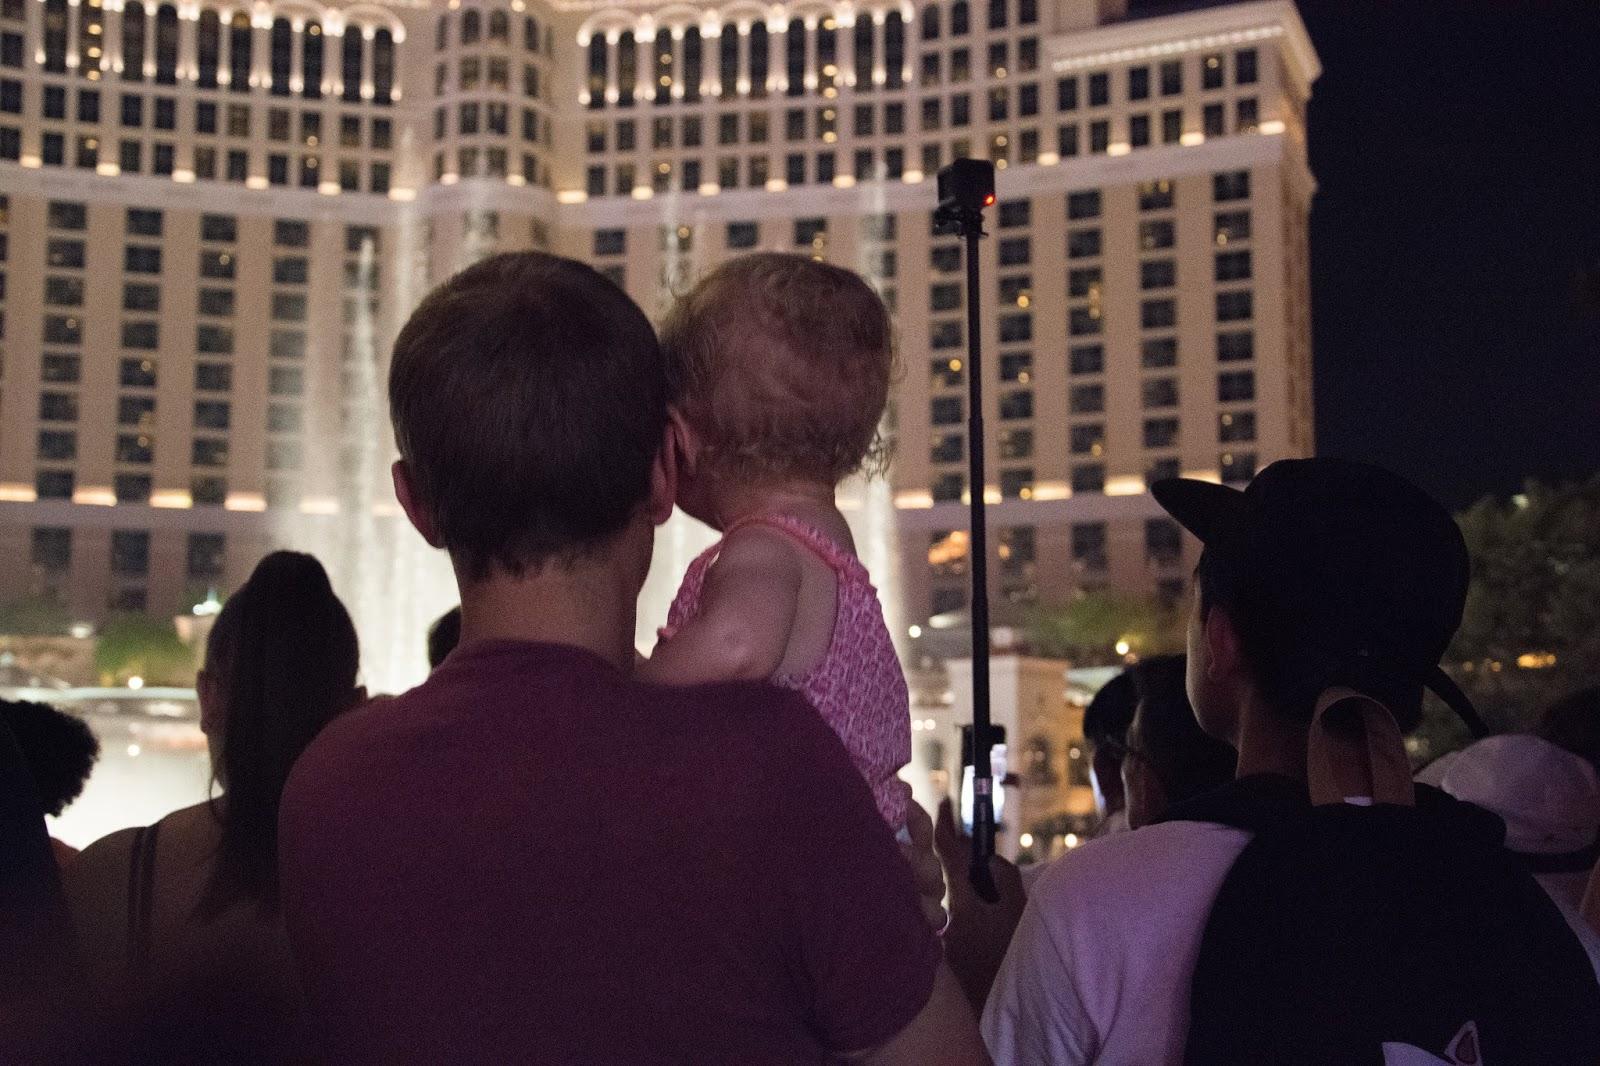 Un Viaje único Las Vegas: The McCoy Family